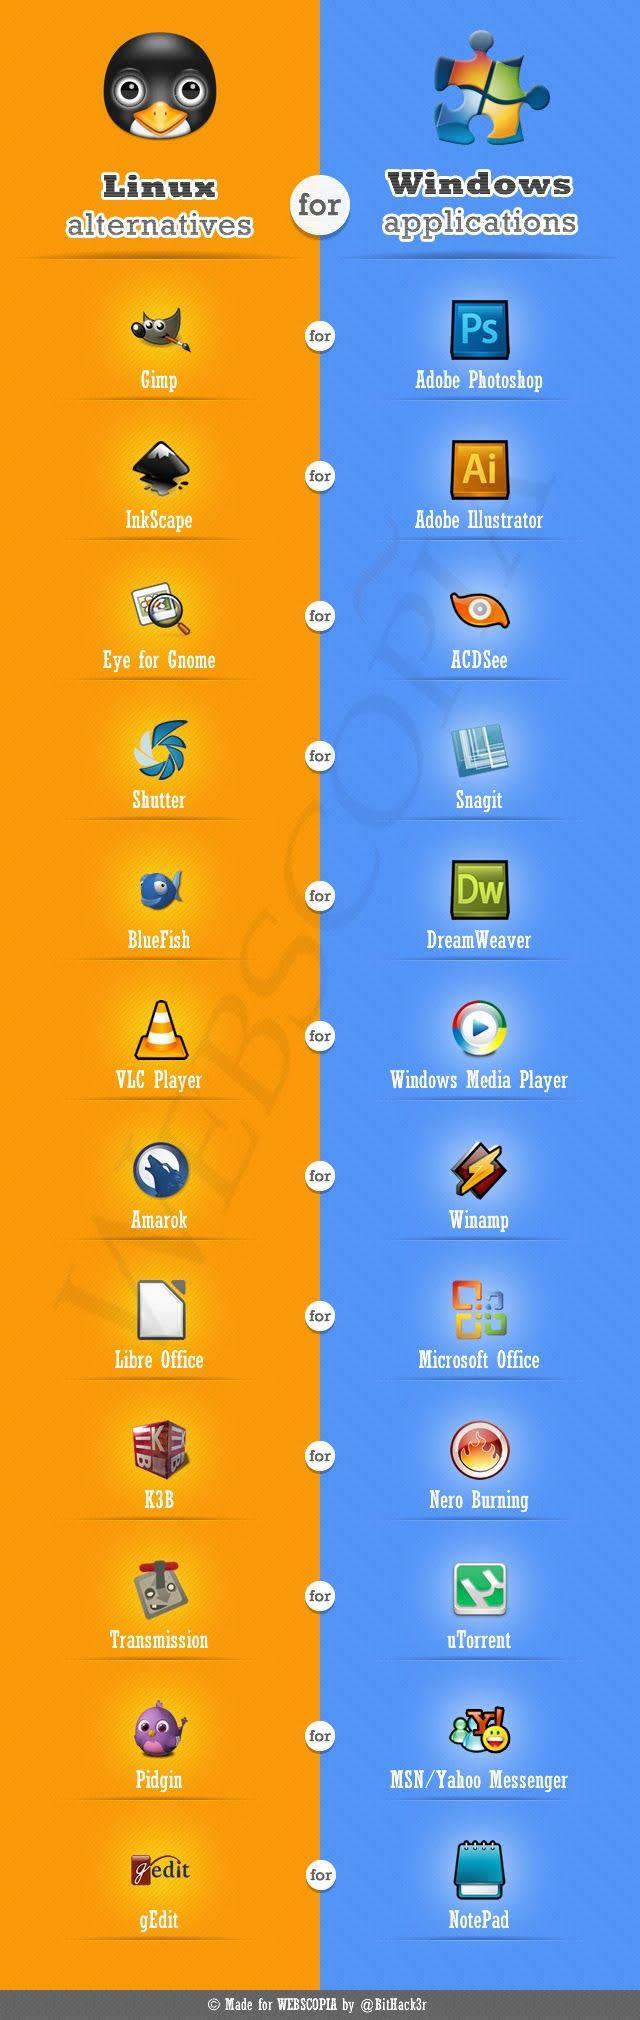 Softwares alternativos